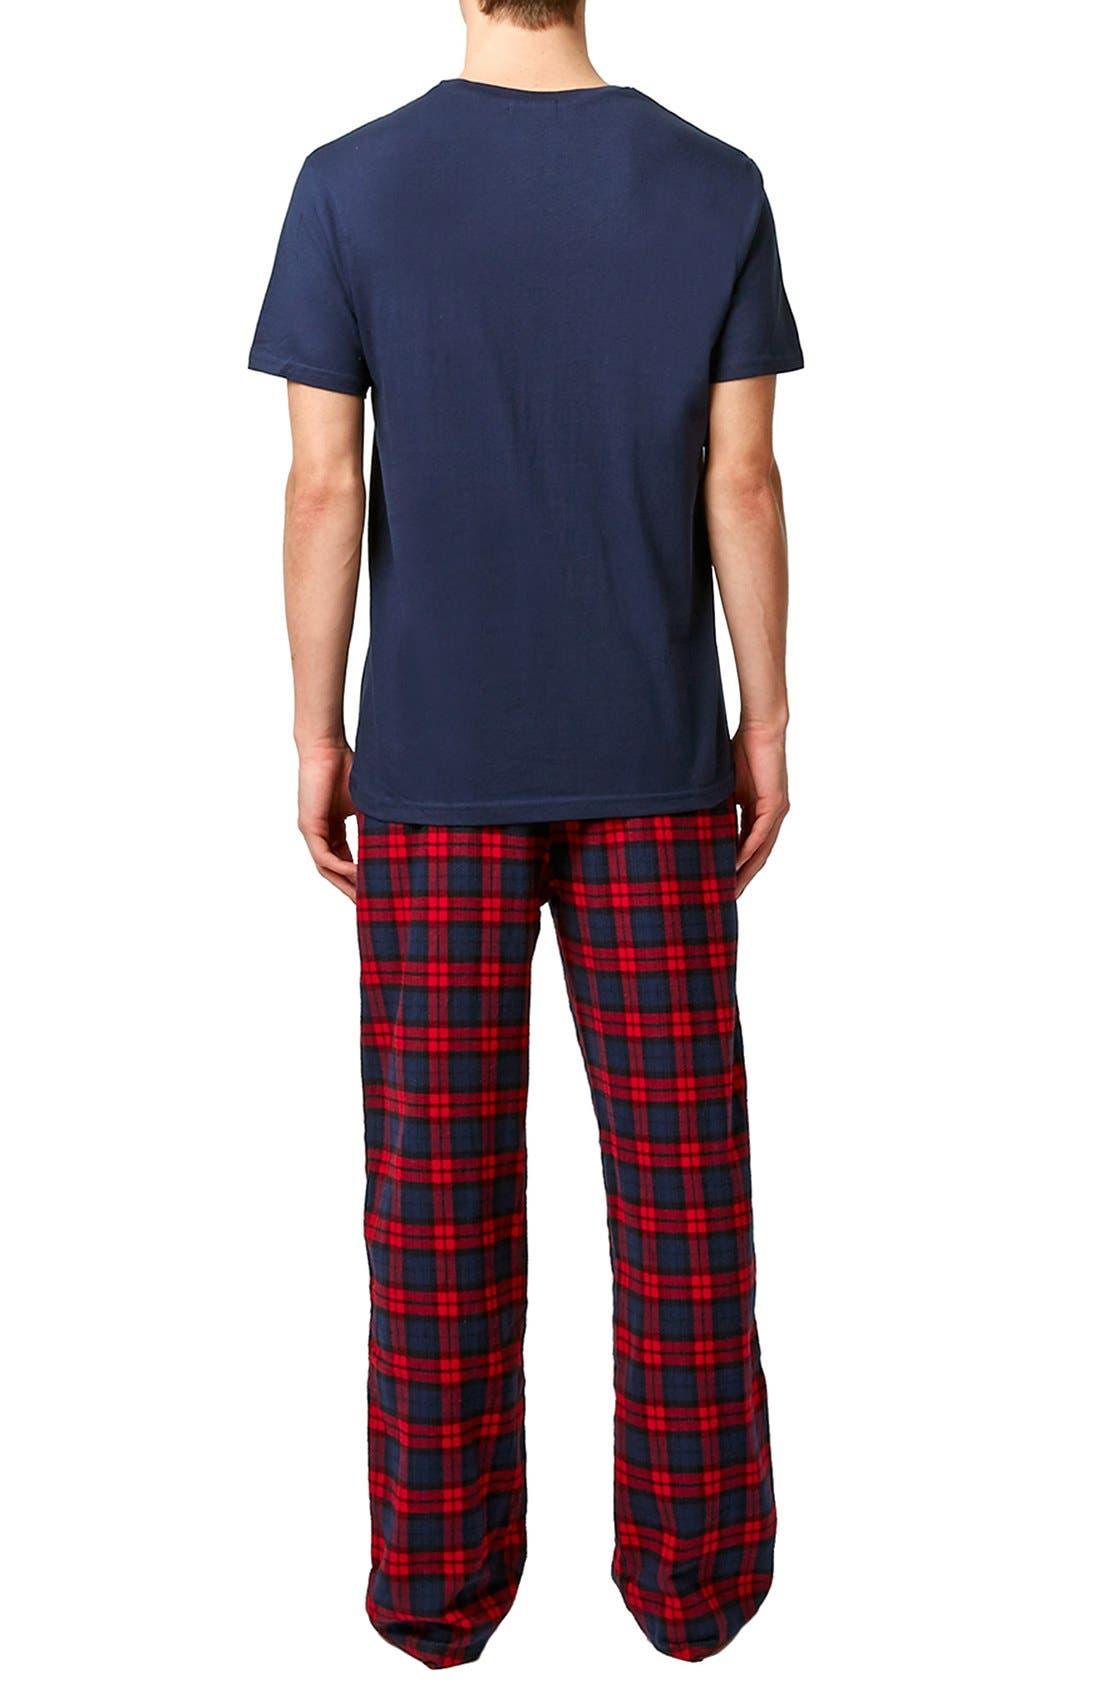 Blue & Red Pajamas,                             Alternate thumbnail 2, color,                             Red Multi